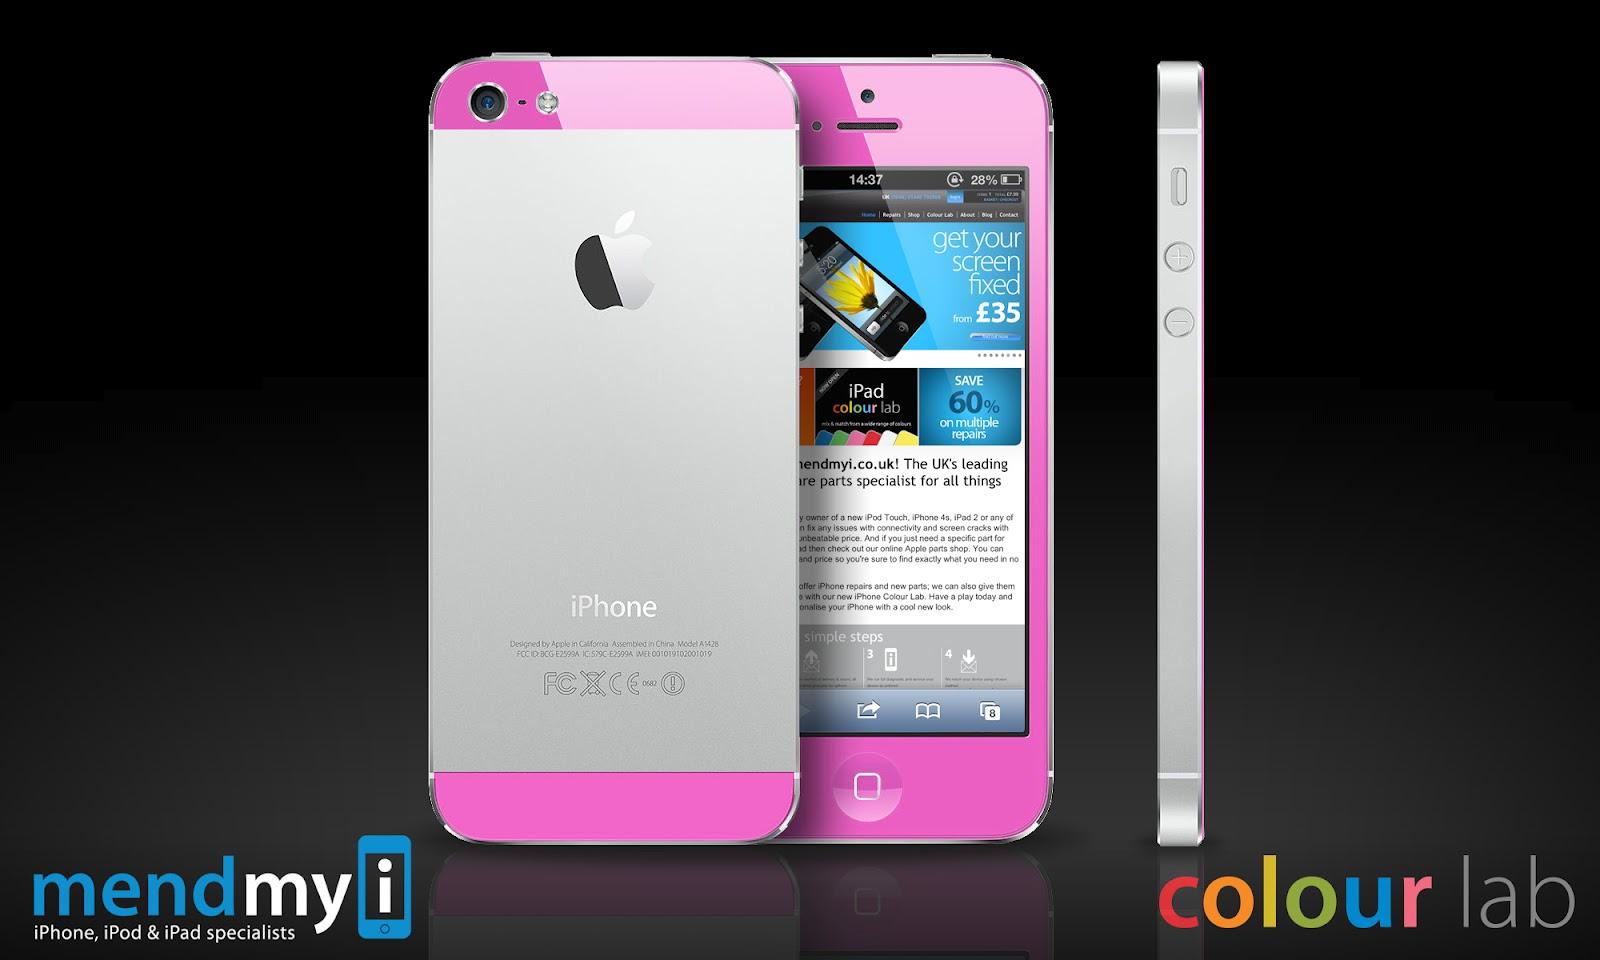 http://1.bp.blogspot.com/-b_zOuoZHBls/UGrZcpV4RNI/AAAAAAAABsQ/P1m_wC4KRac/s1600/3-Pink%2BiPhone5.jpg